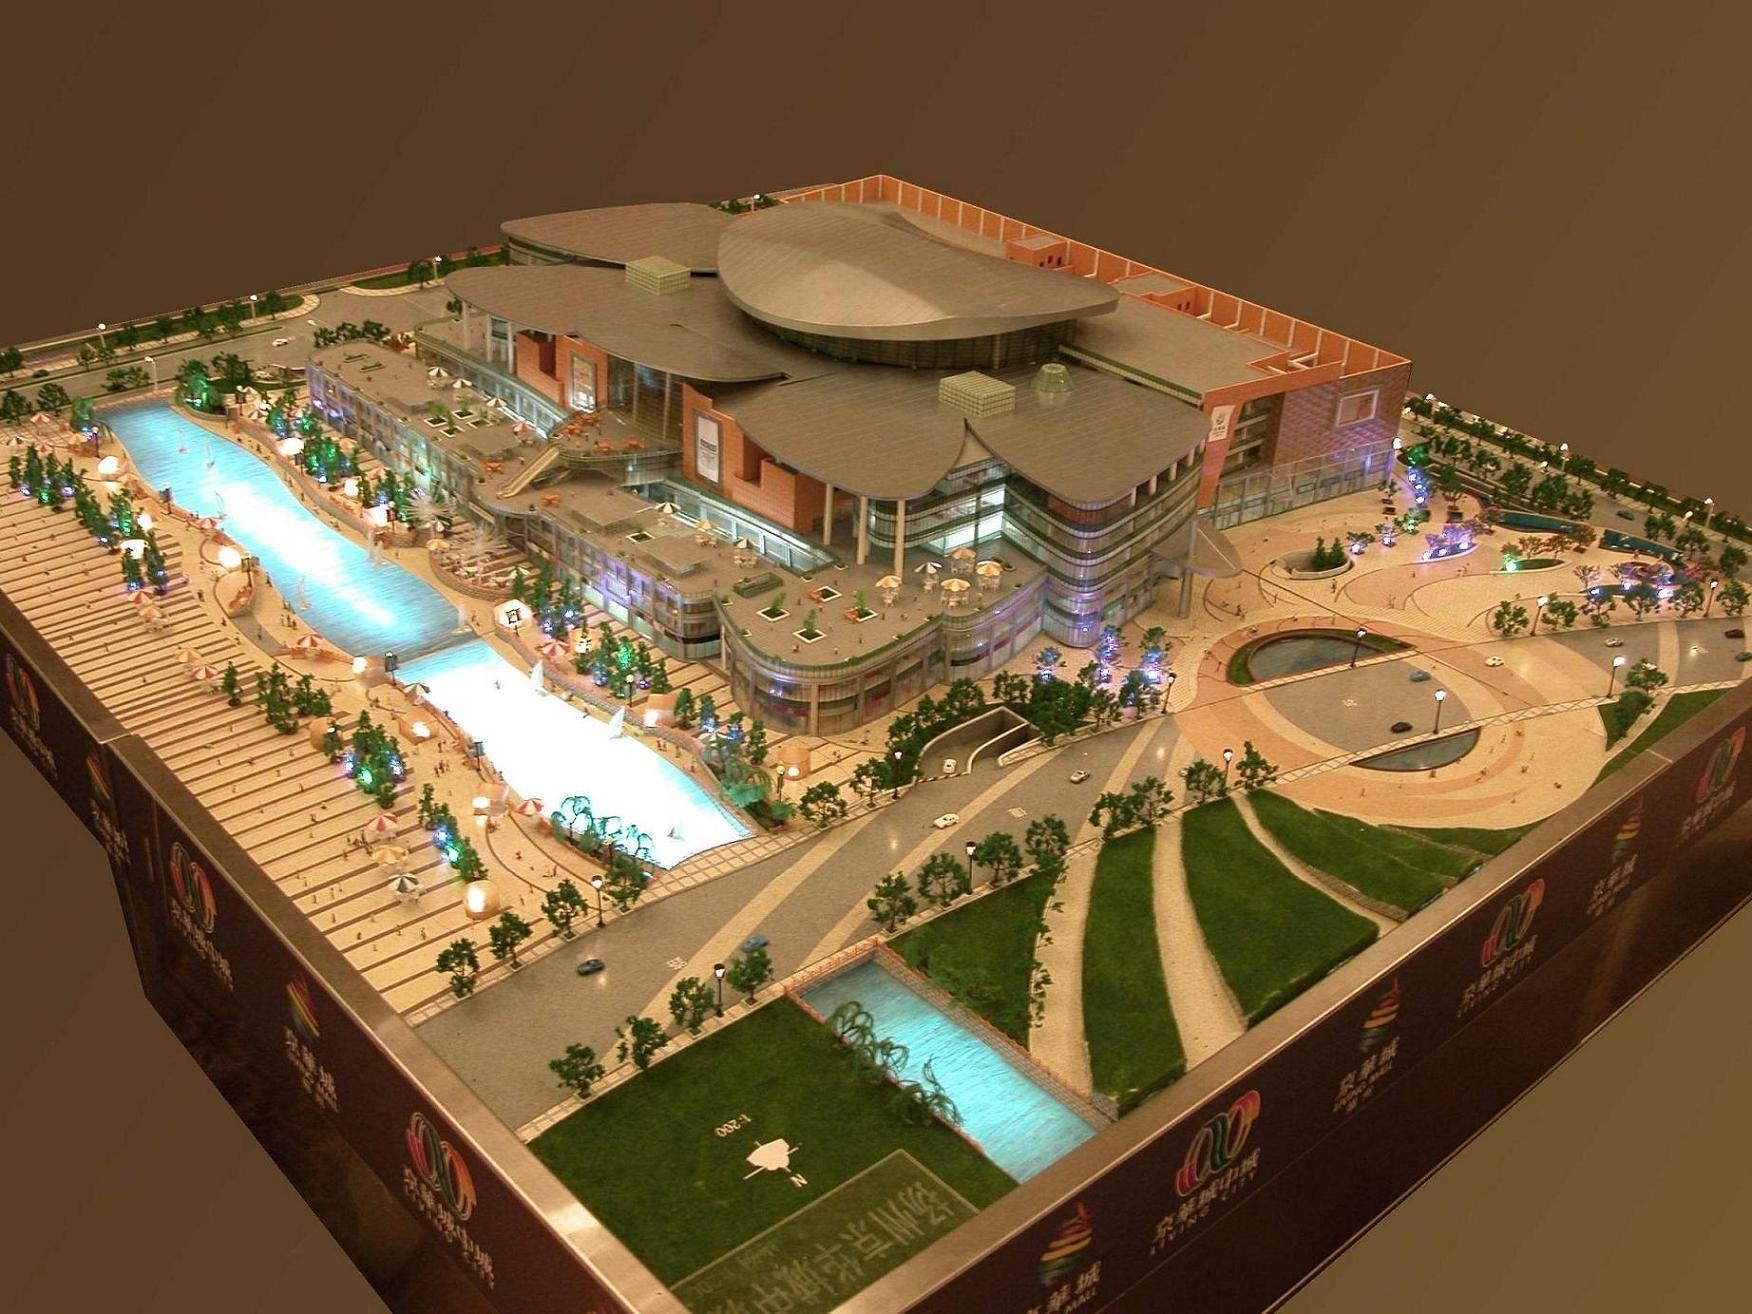 Architectural Scale Model Builder Juwei Scale Model Shanghai Co Ltd